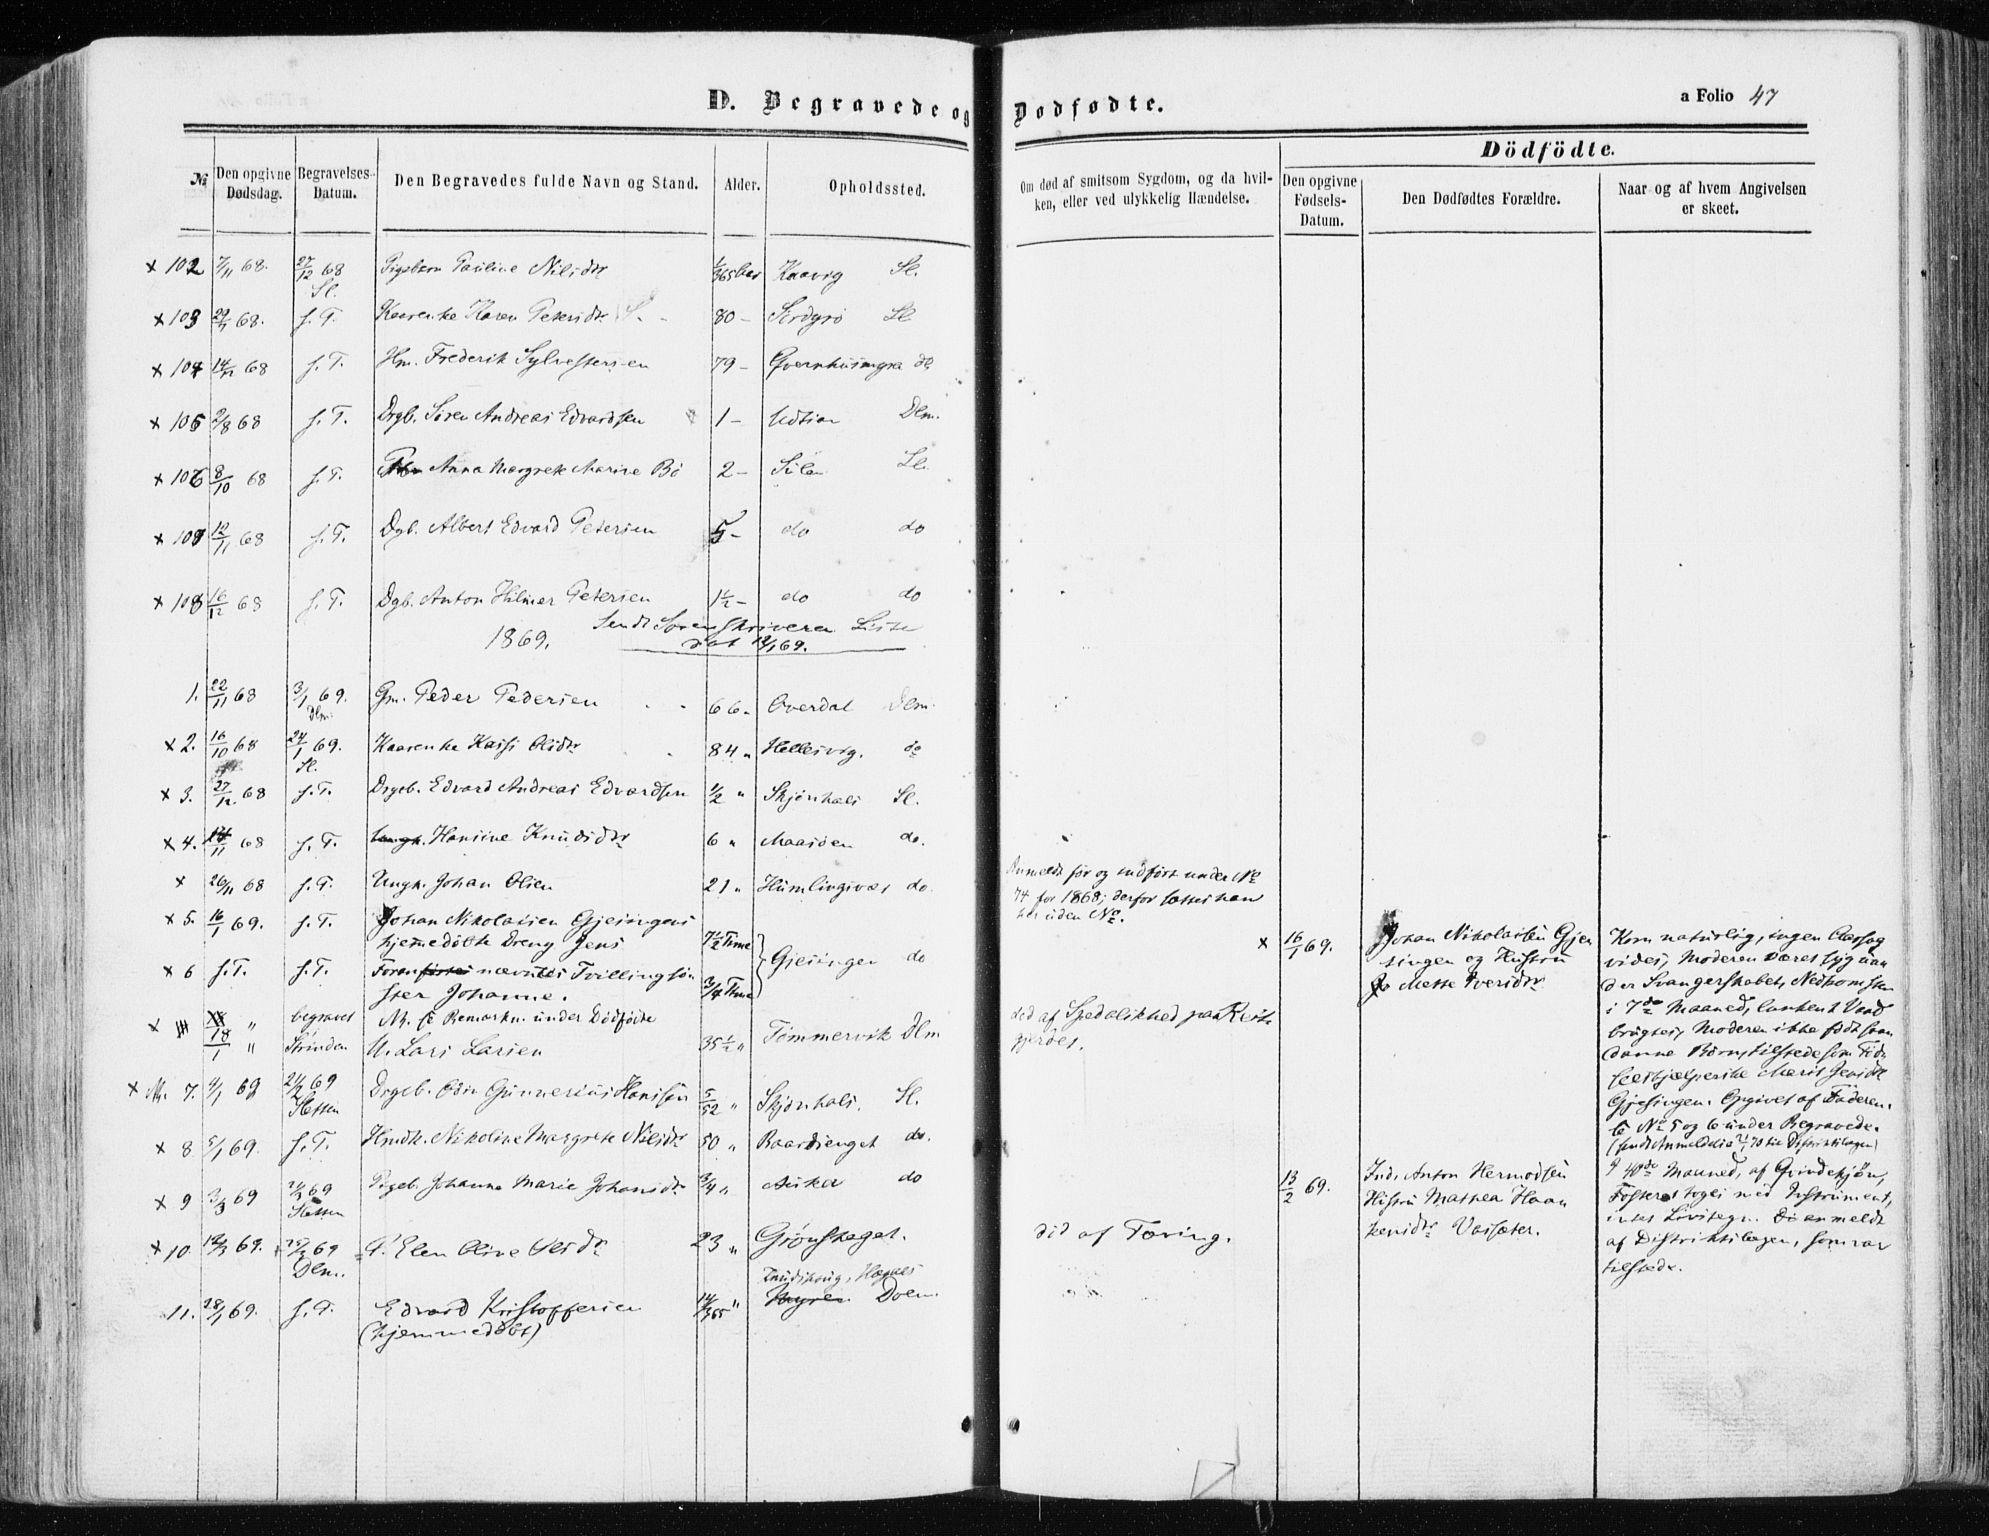 SAT, Ministerialprotokoller, klokkerbøker og fødselsregistre - Sør-Trøndelag, 634/L0531: Parish register (official) no. 634A07, 1861-1870, p. 47